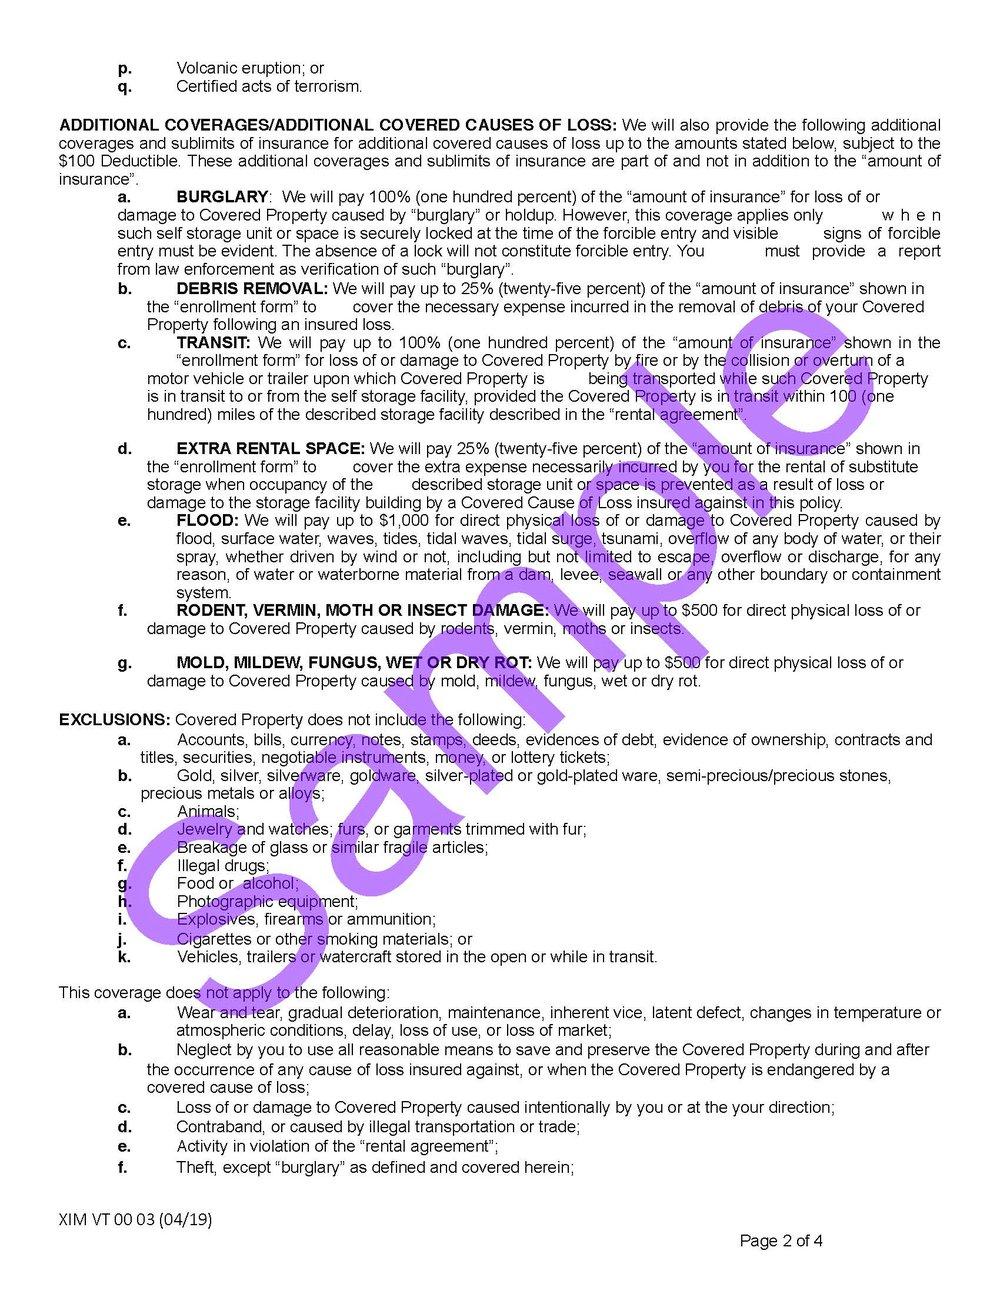 XIM VT 00 03 04 19 Vermont Certificate of InsuranceSample_Page_2.jpg